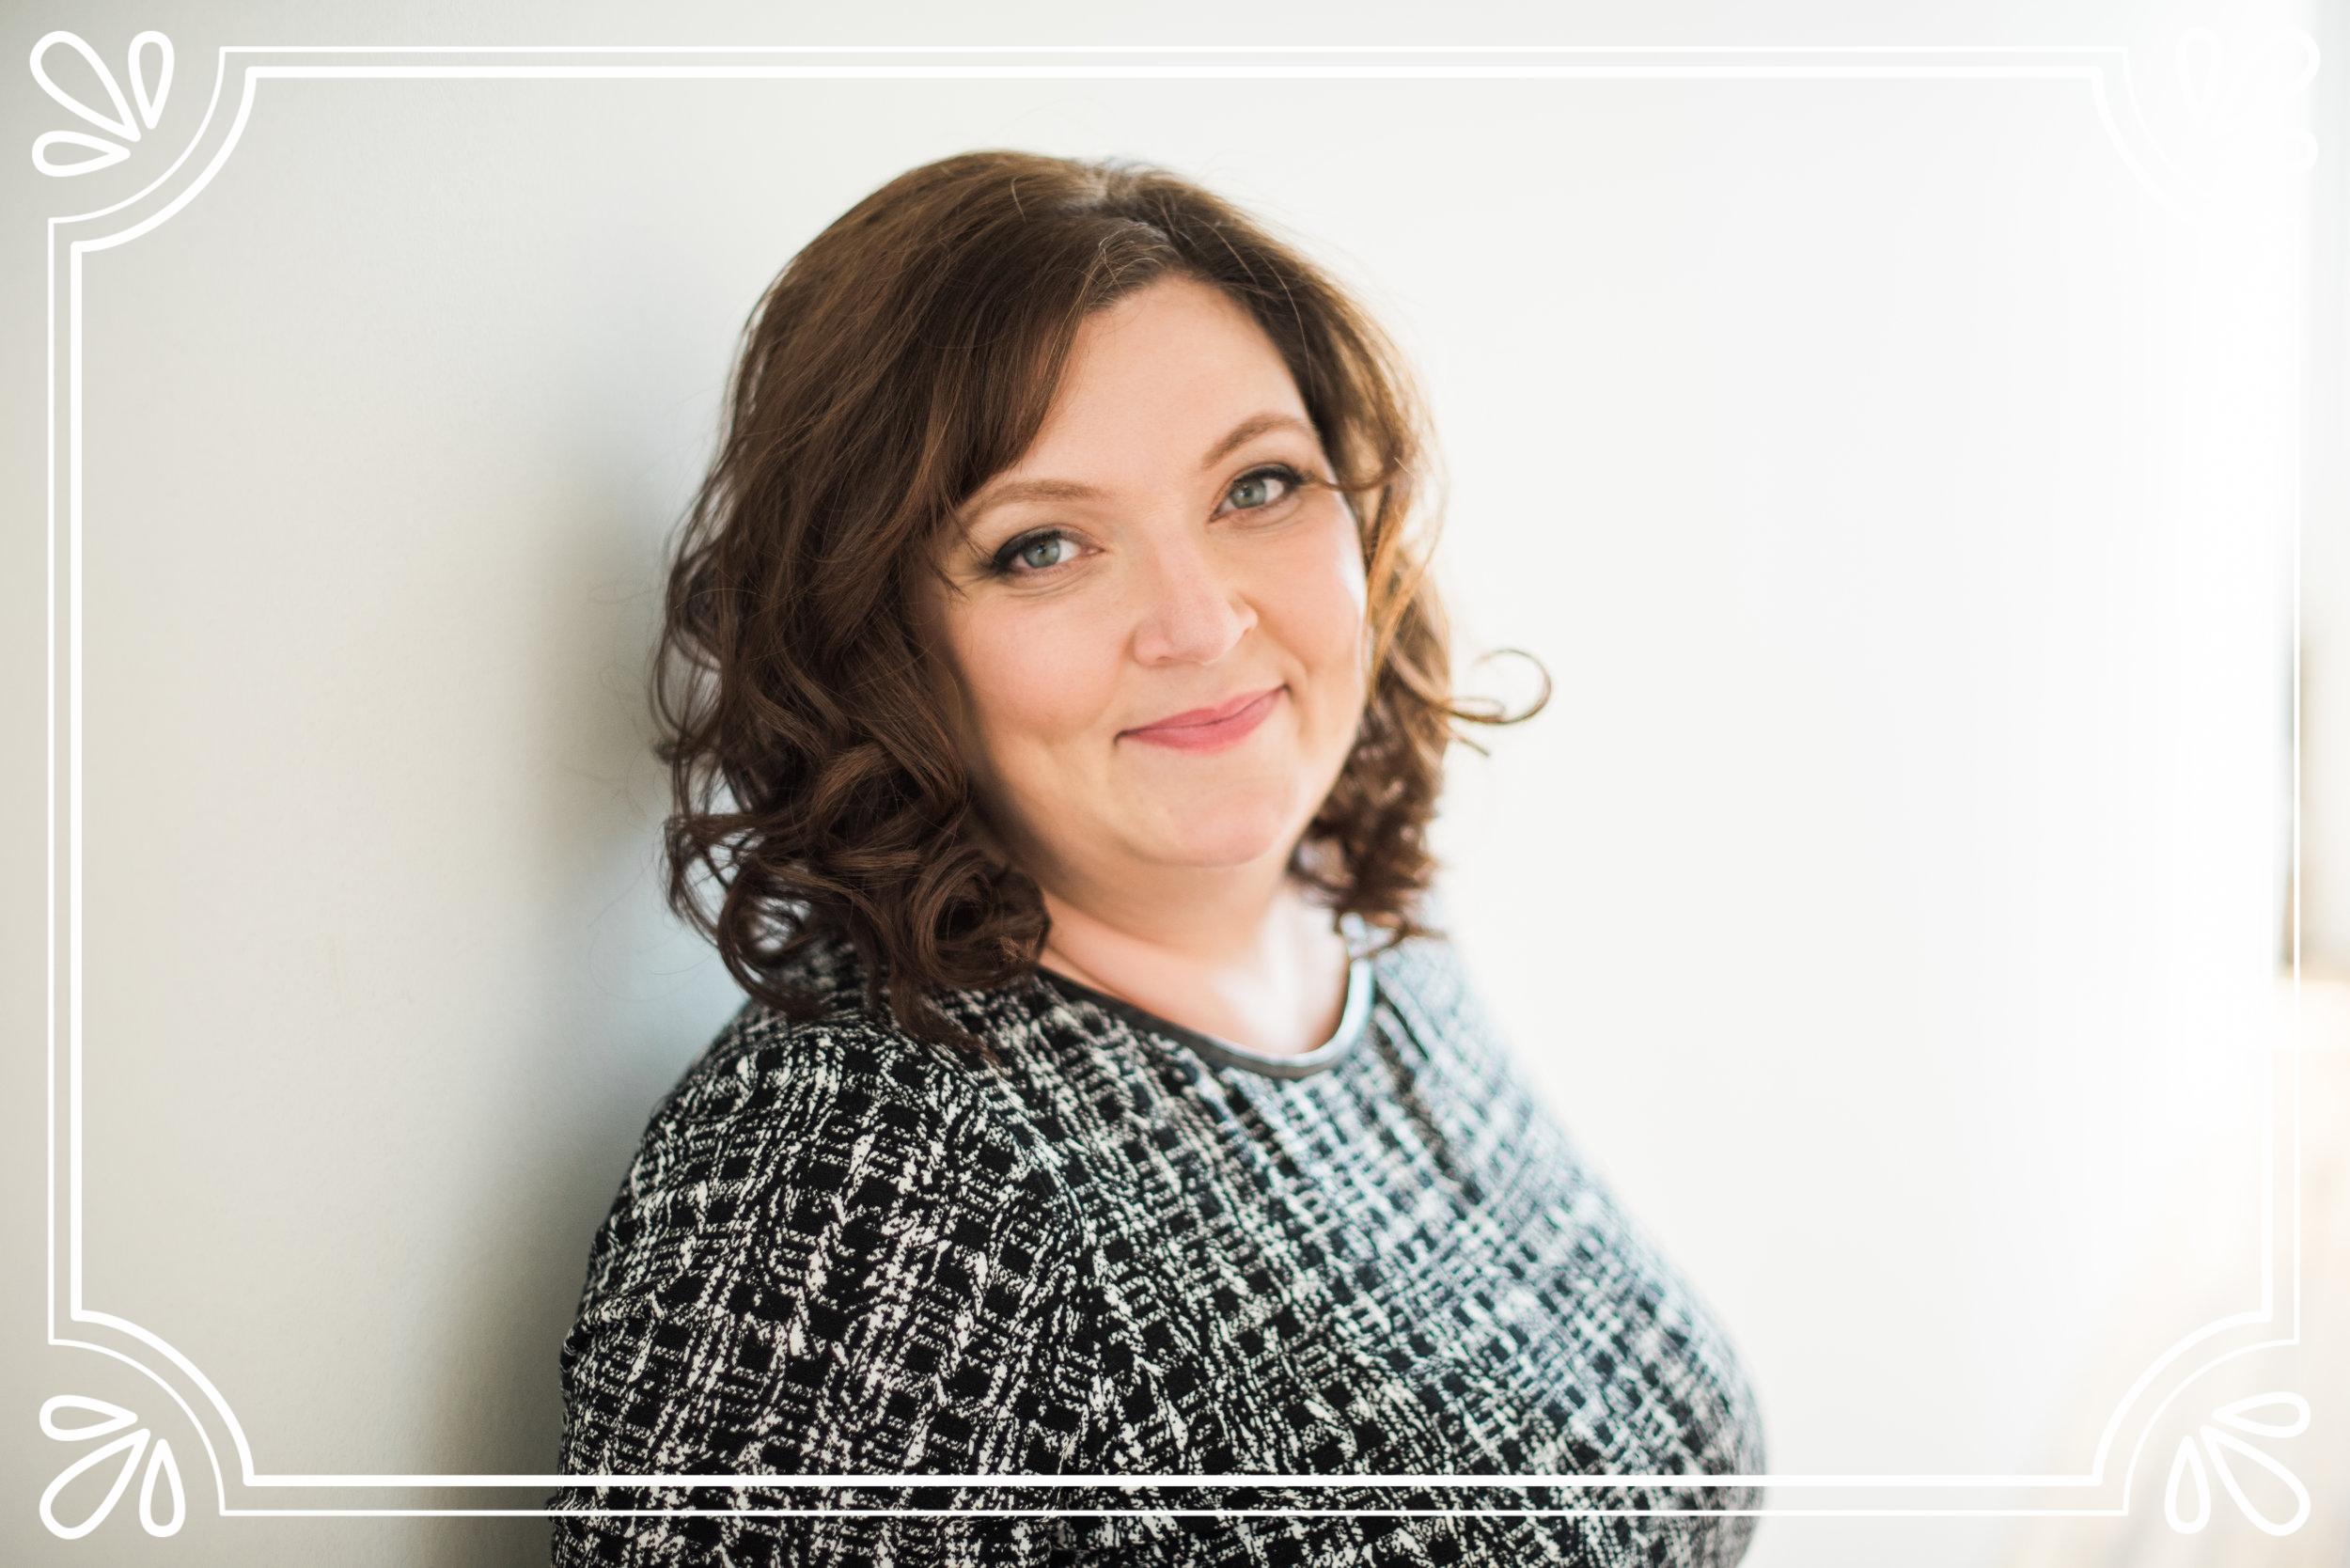 Tanya Costigan, Owner & Creative Director